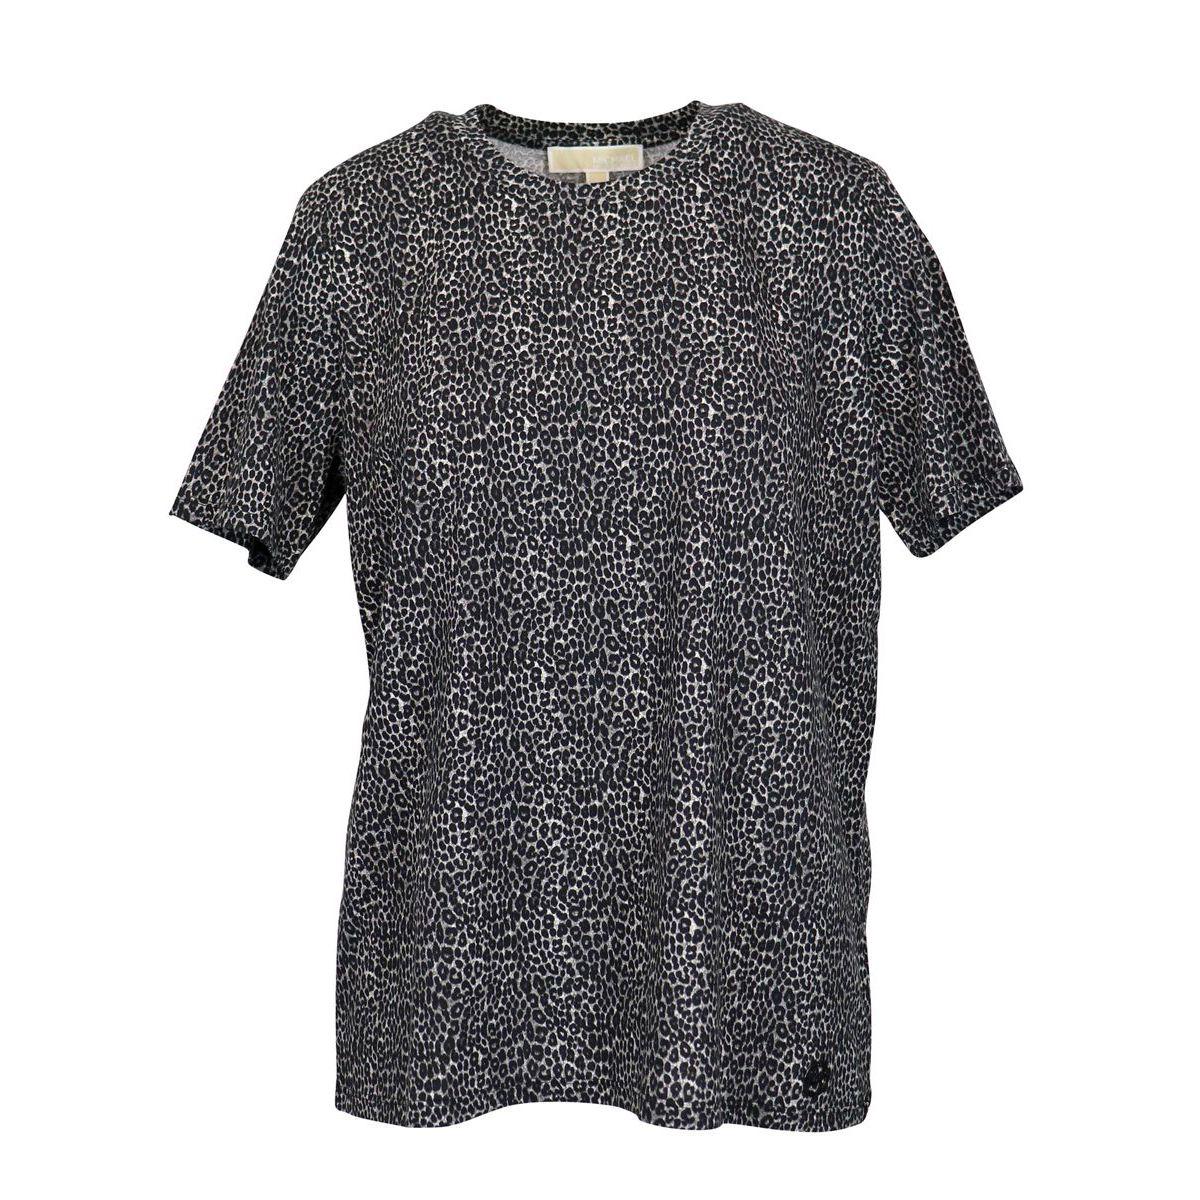 Crew-neck cotton t-shirt with animal print Grey Michael Kors